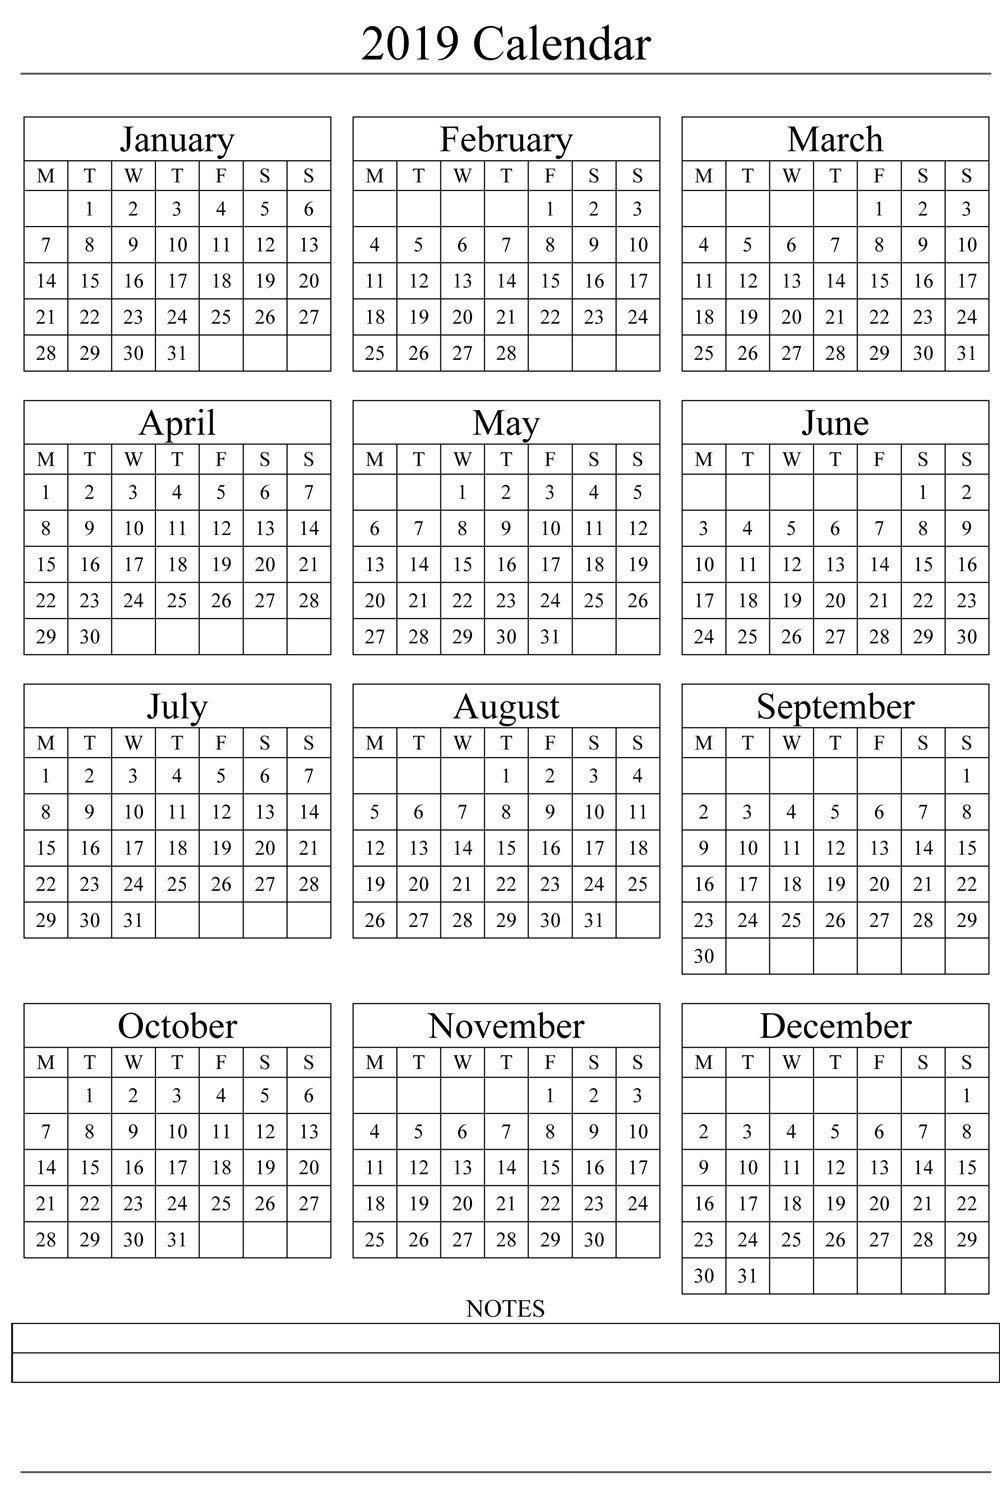 2019 Printable Calendar Templates - Blank Word Pdf - 2018 Calendar Calendar 2019 Pdf